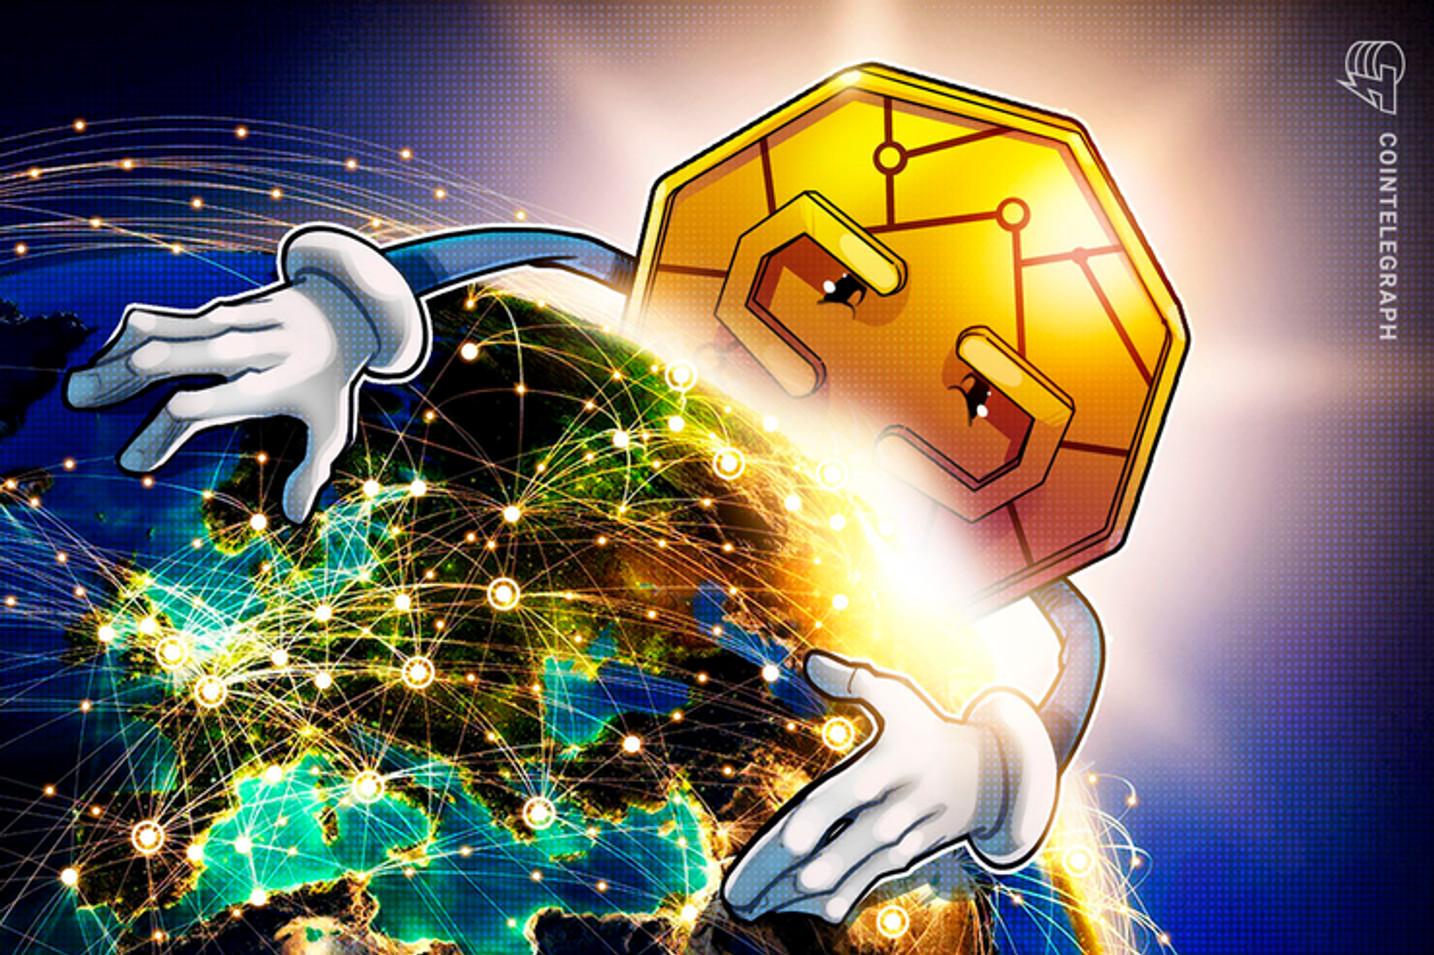 Nas regras da CVM, Mercado Bitcoin anuncia parceria com a Monkey Exchange para 'tokenizar' recebíveis de empresas